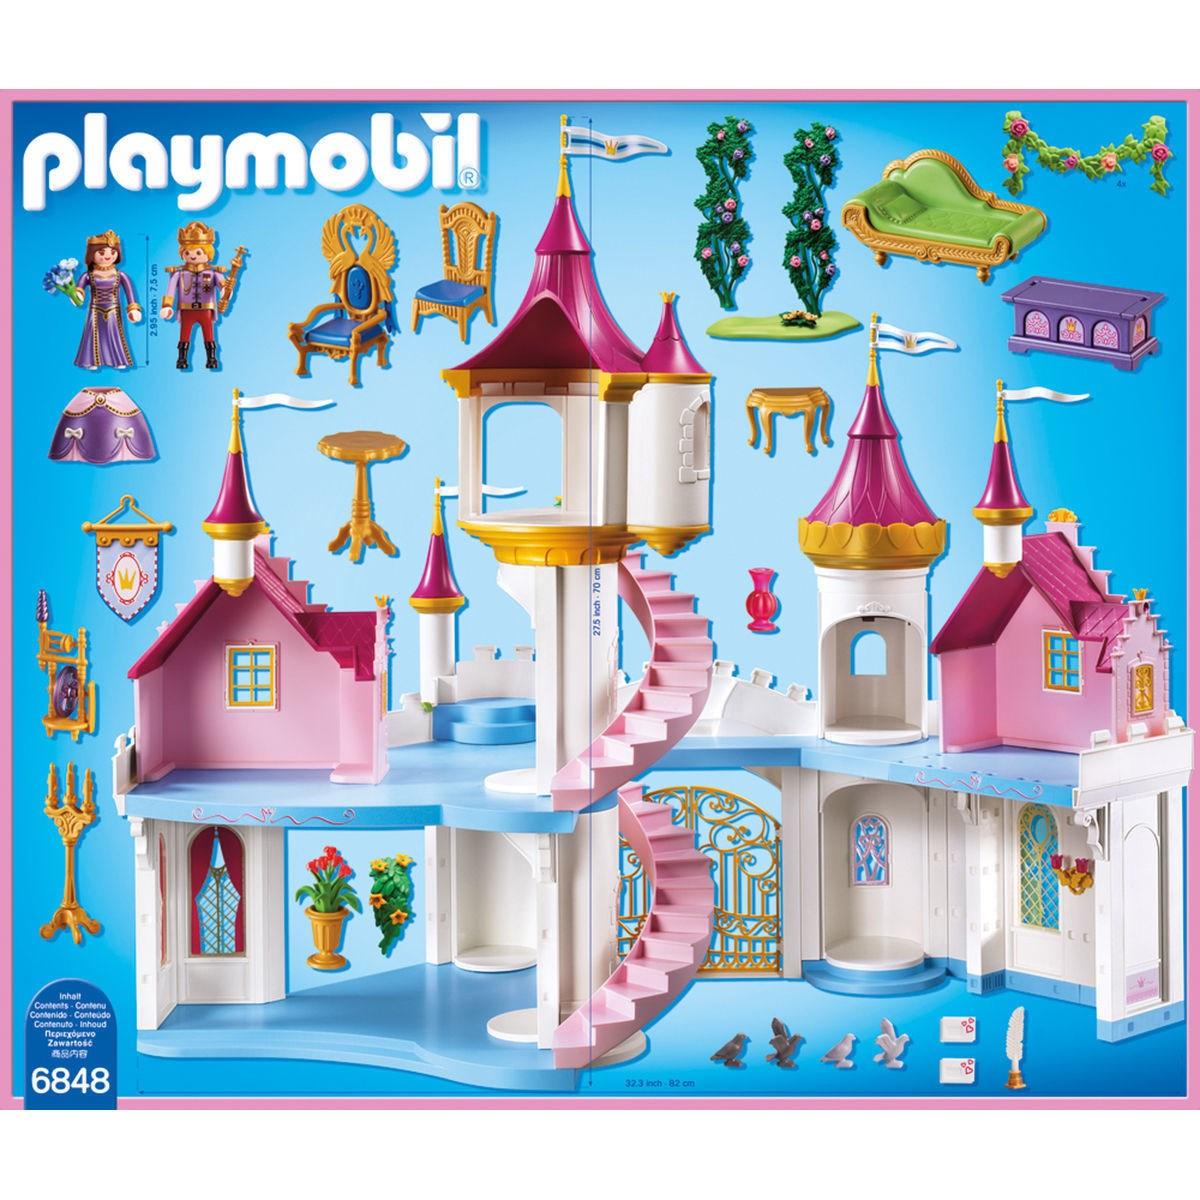 Playmobil chambre bébé princesse - stepindance.fr